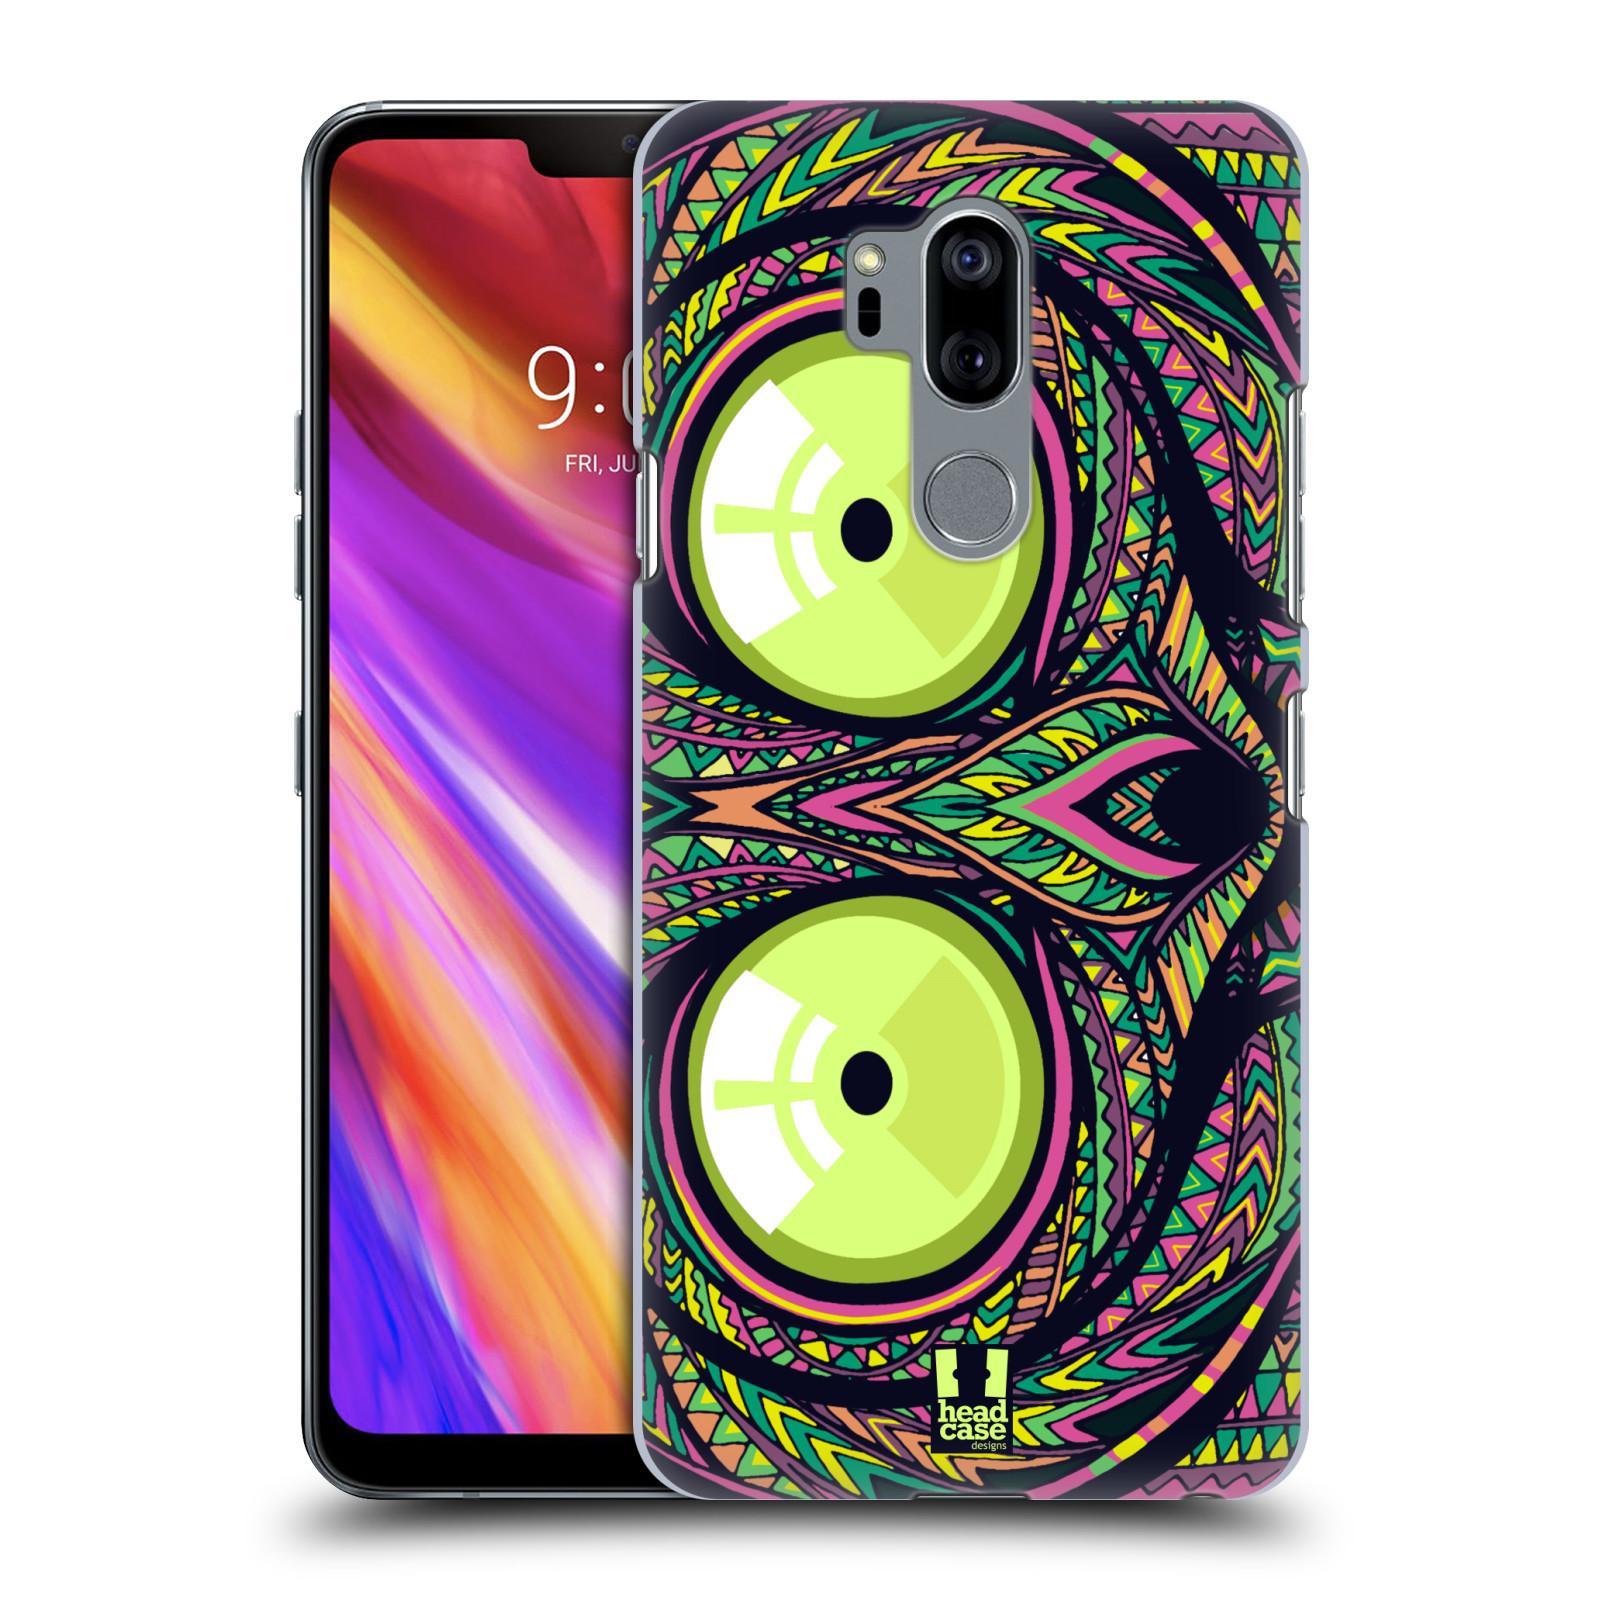 Plastové pouzdro na mobil LG G7 ThinQ - Head Case - AZTEC NÁRTOUN